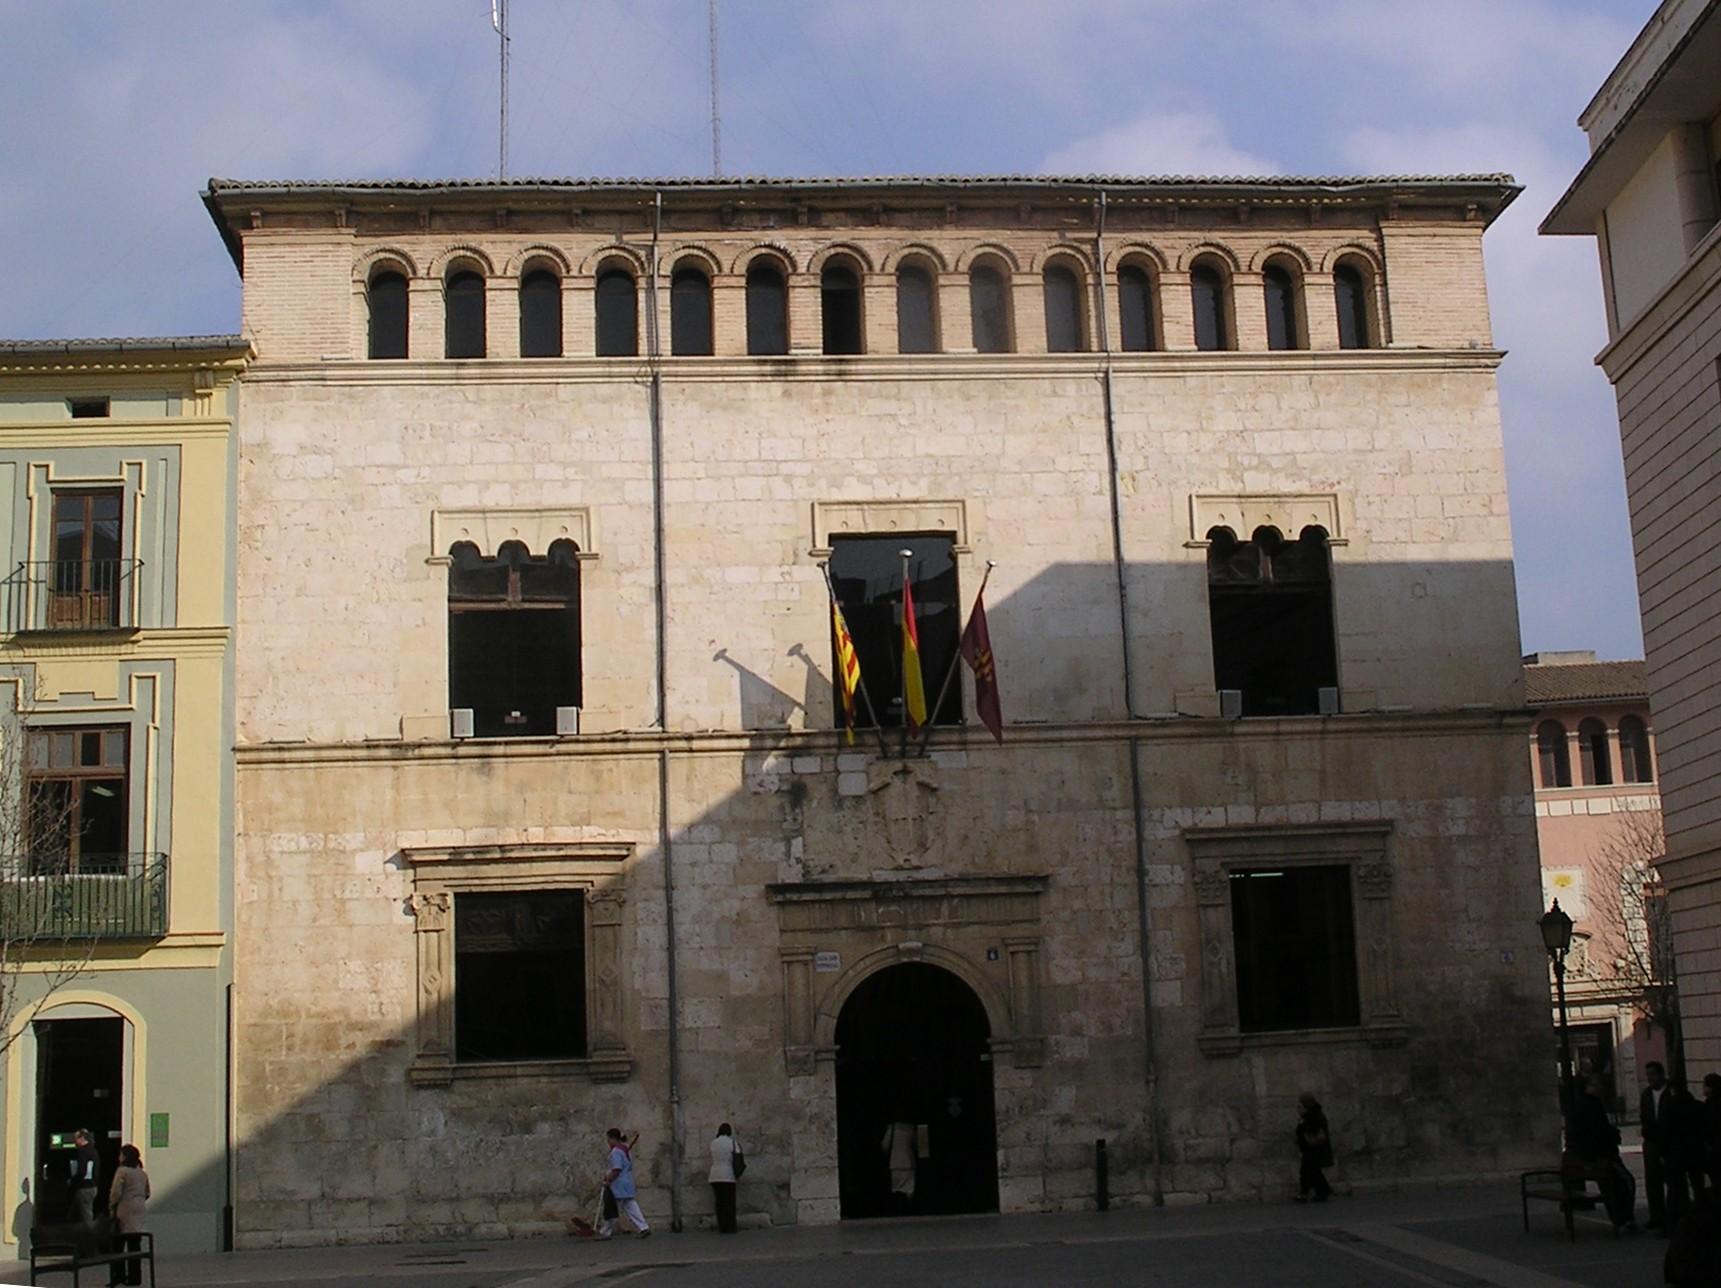 File fachada del ayuntamiento de alzira valencia espa a - Hoteles en alzira valencia ...